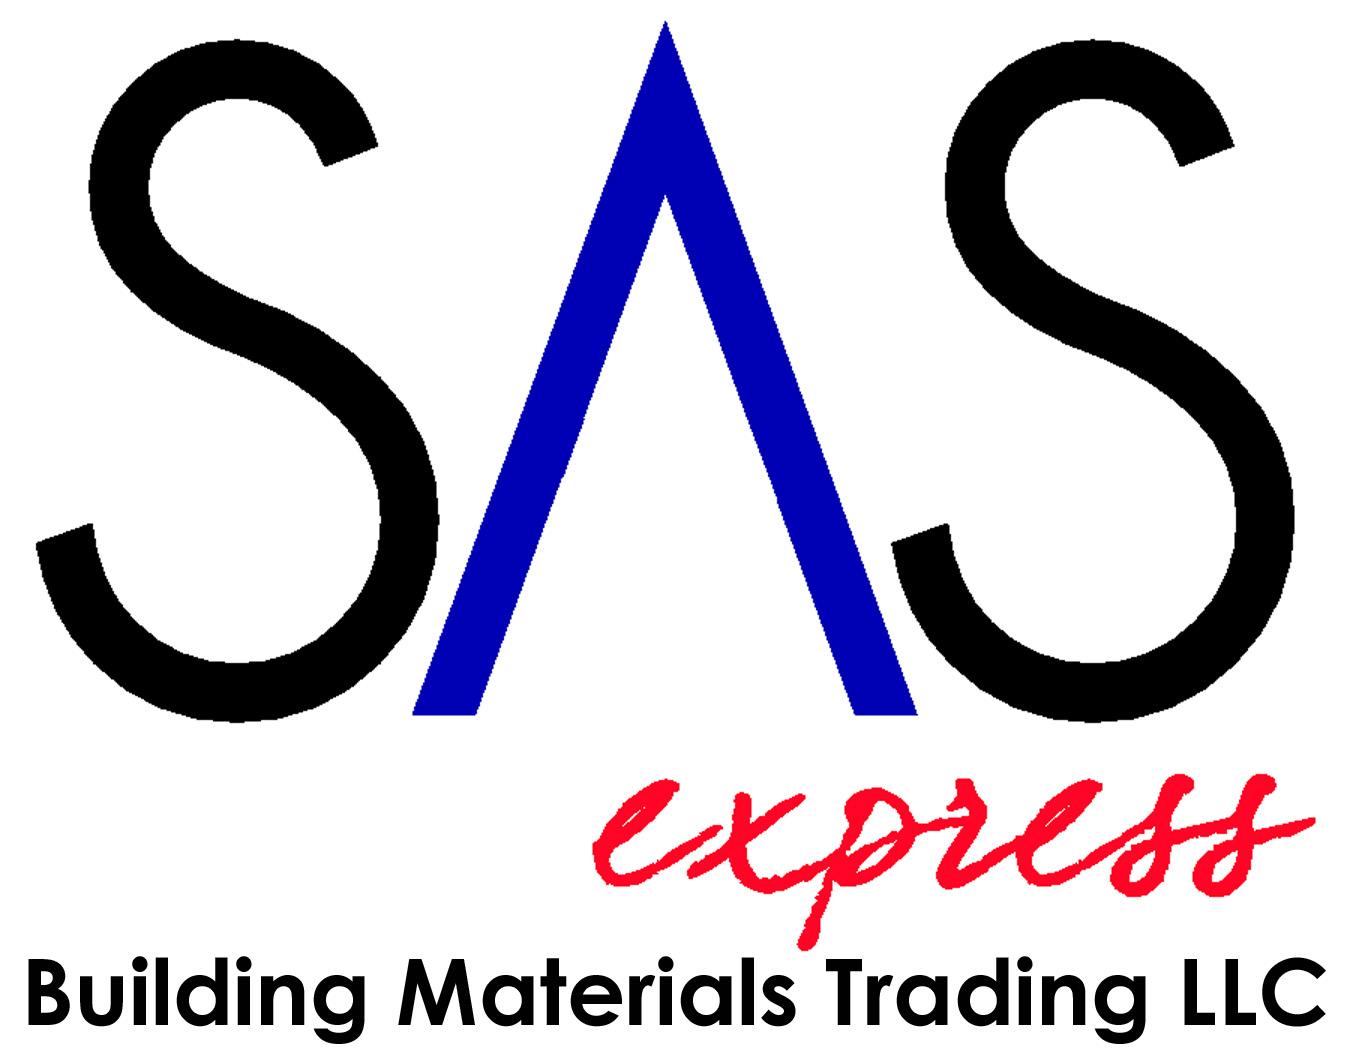 SAS Express Building Materials Trading LLC